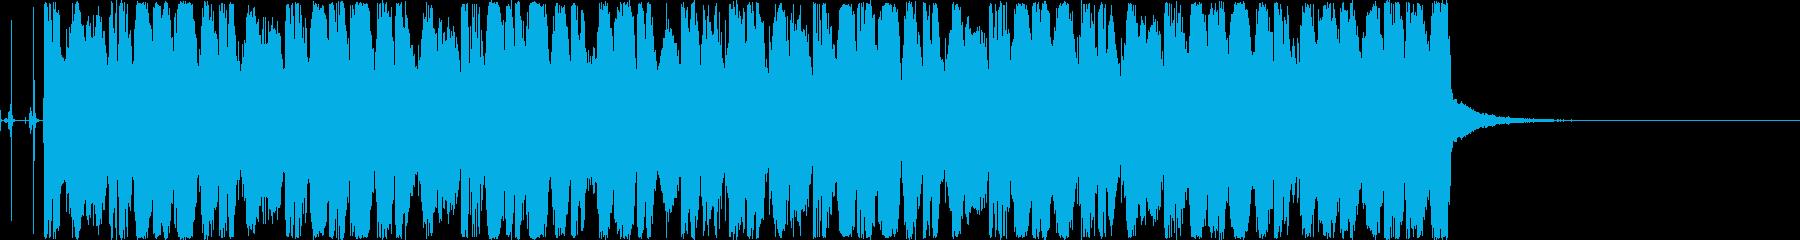 Future Pop 2の再生済みの波形